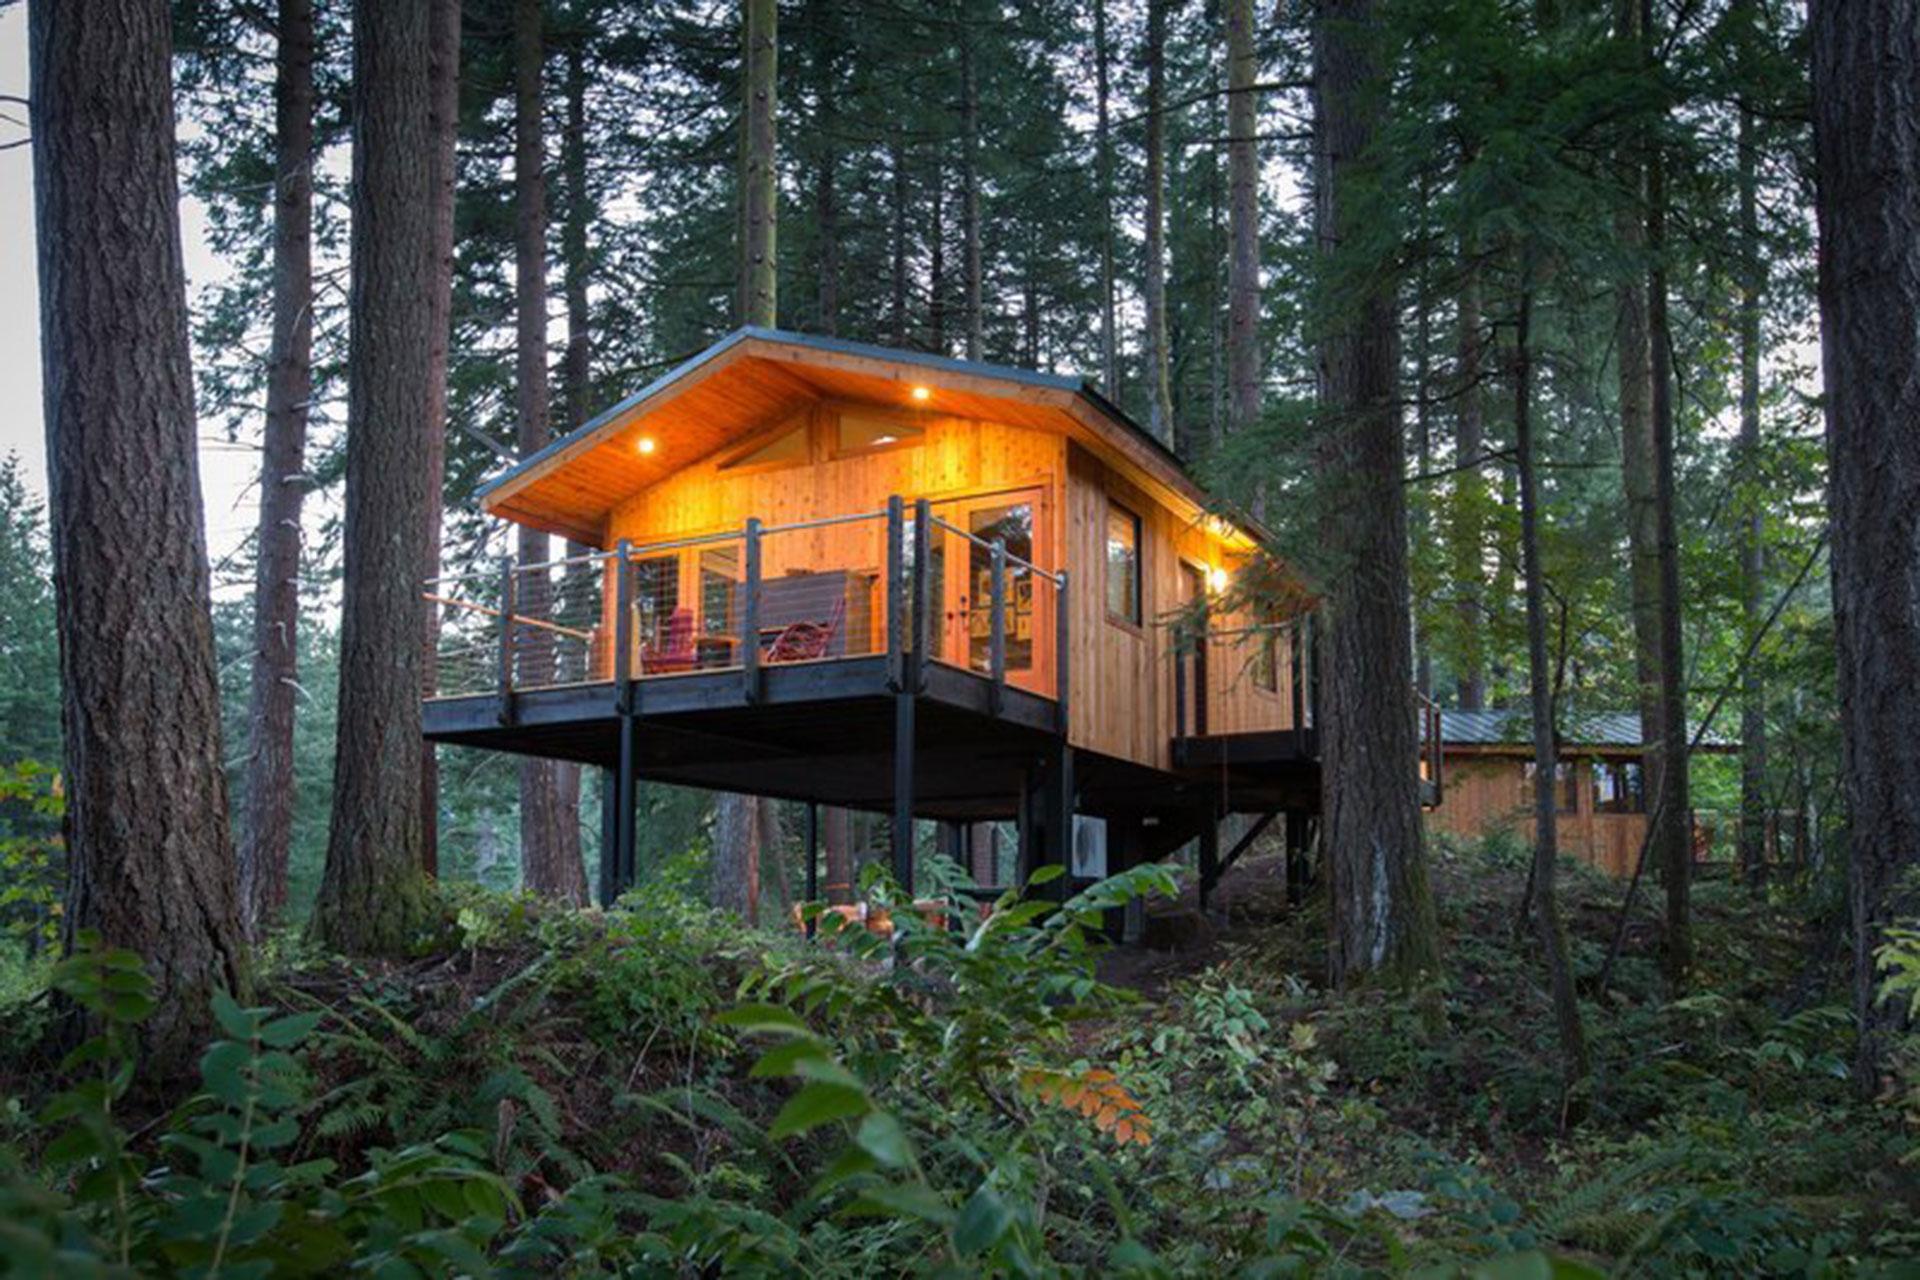 Treehouse at Skamania Lodge in Stevenson, Washington; Courtesy of Skamania Lodge